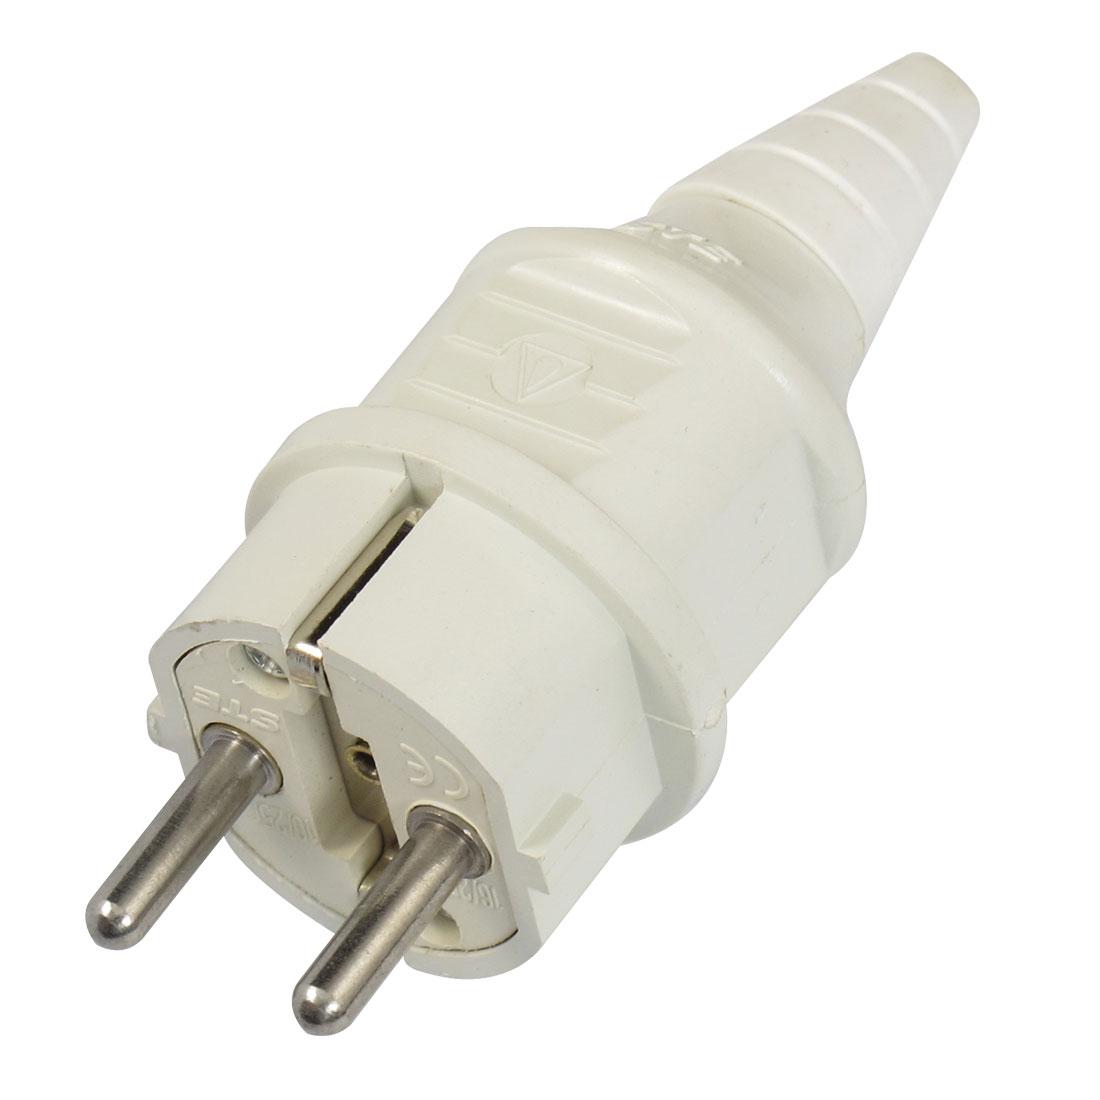 16A AC 250V IP44 2 Poles Industrial ST-105/02H White EU Plug